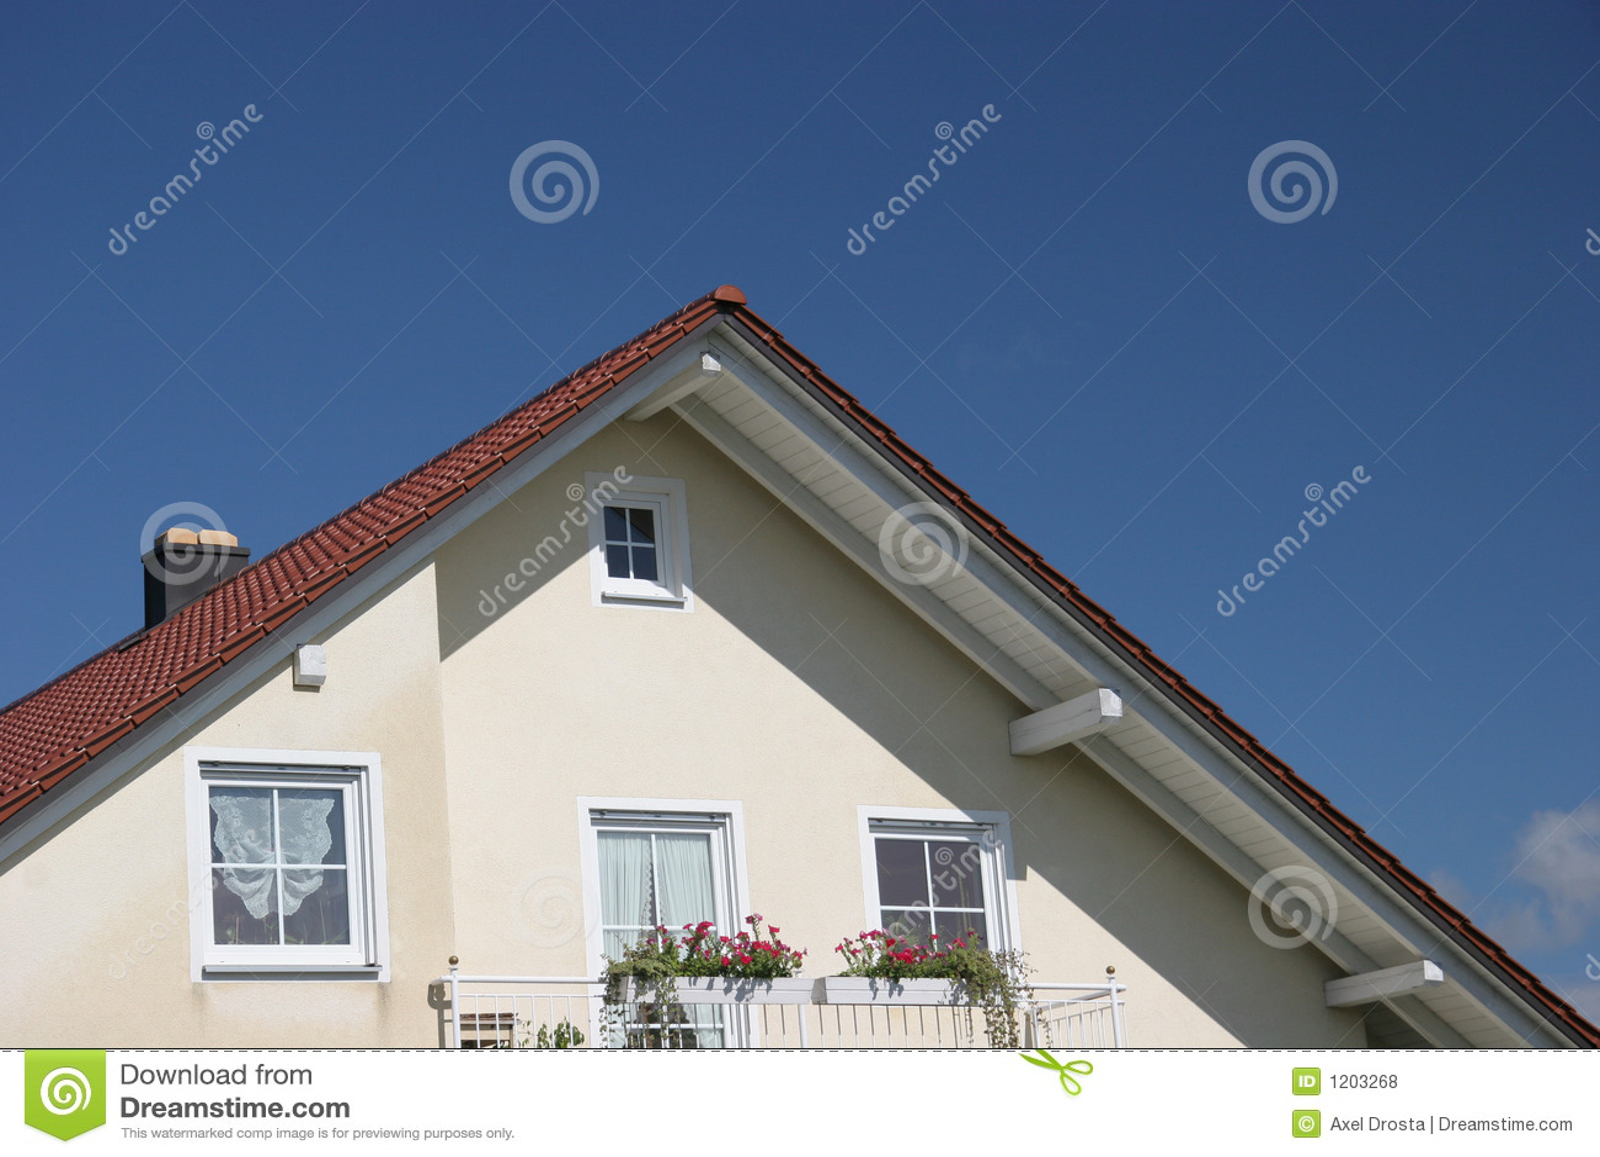 Balcony and gable on house